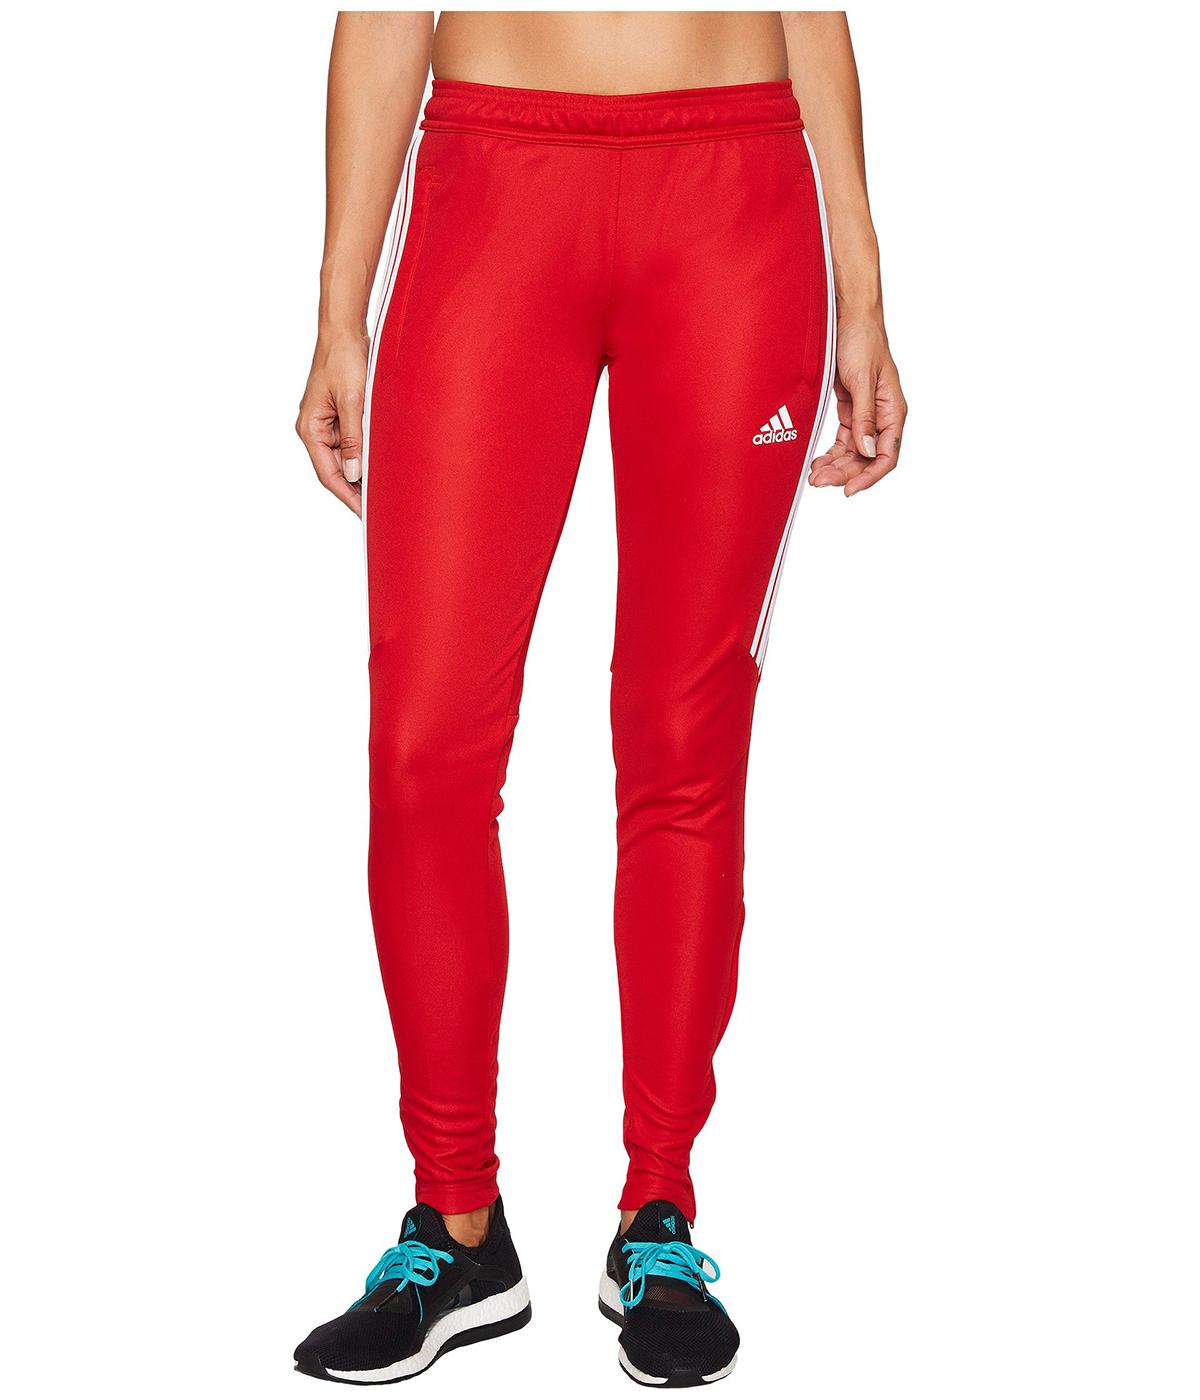 Adidas Tiro Pants Red